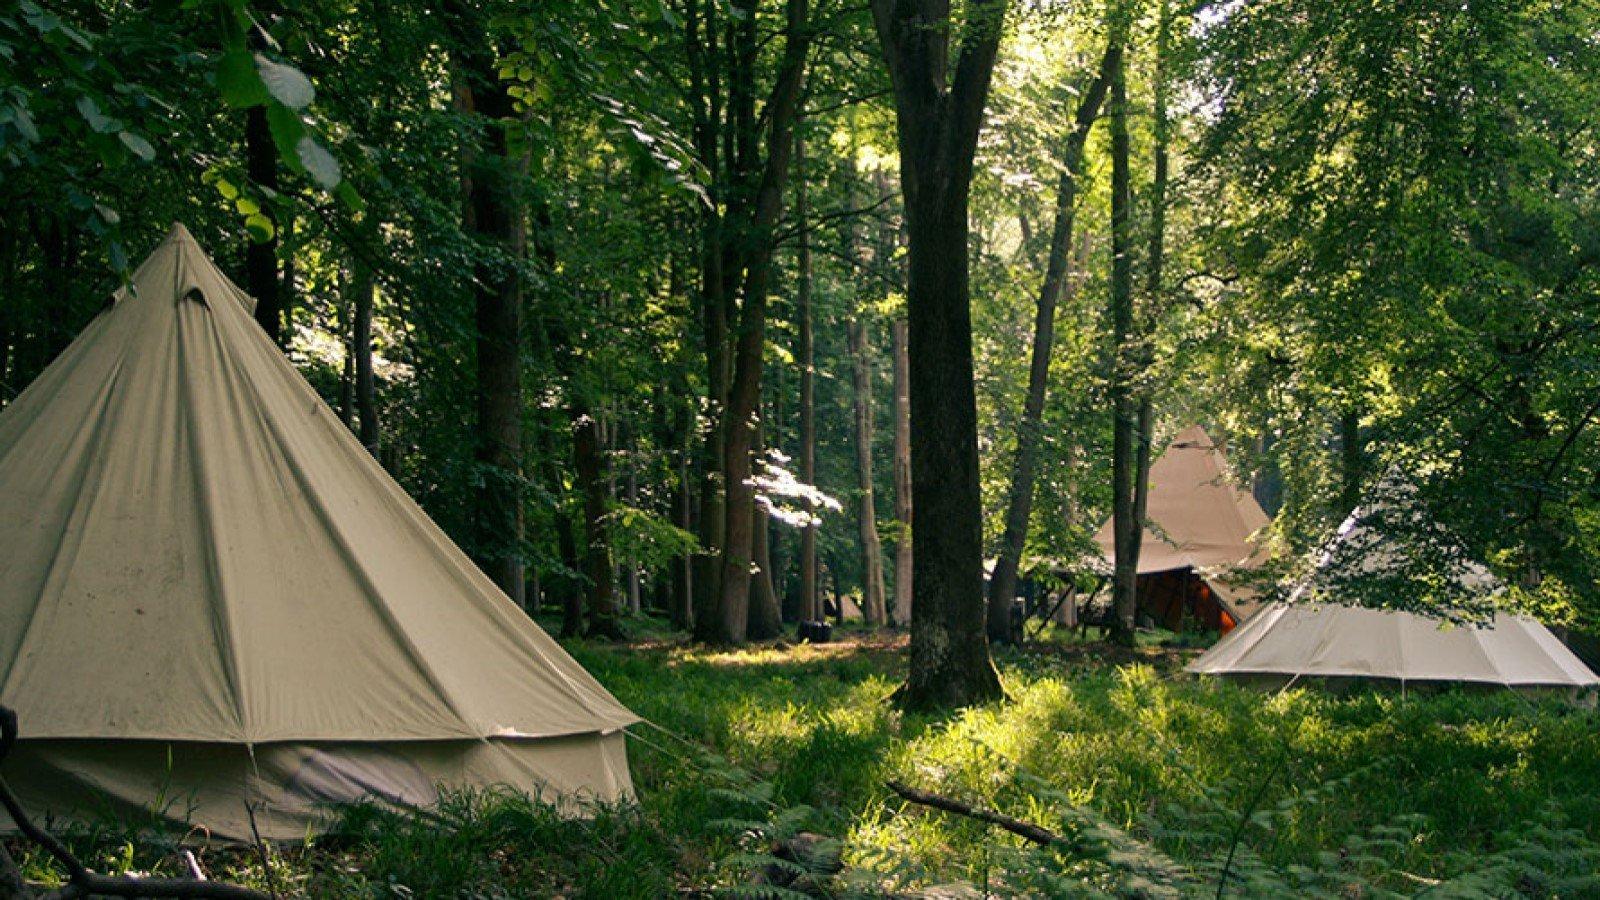 Camp Wilderness at Cornbury Park